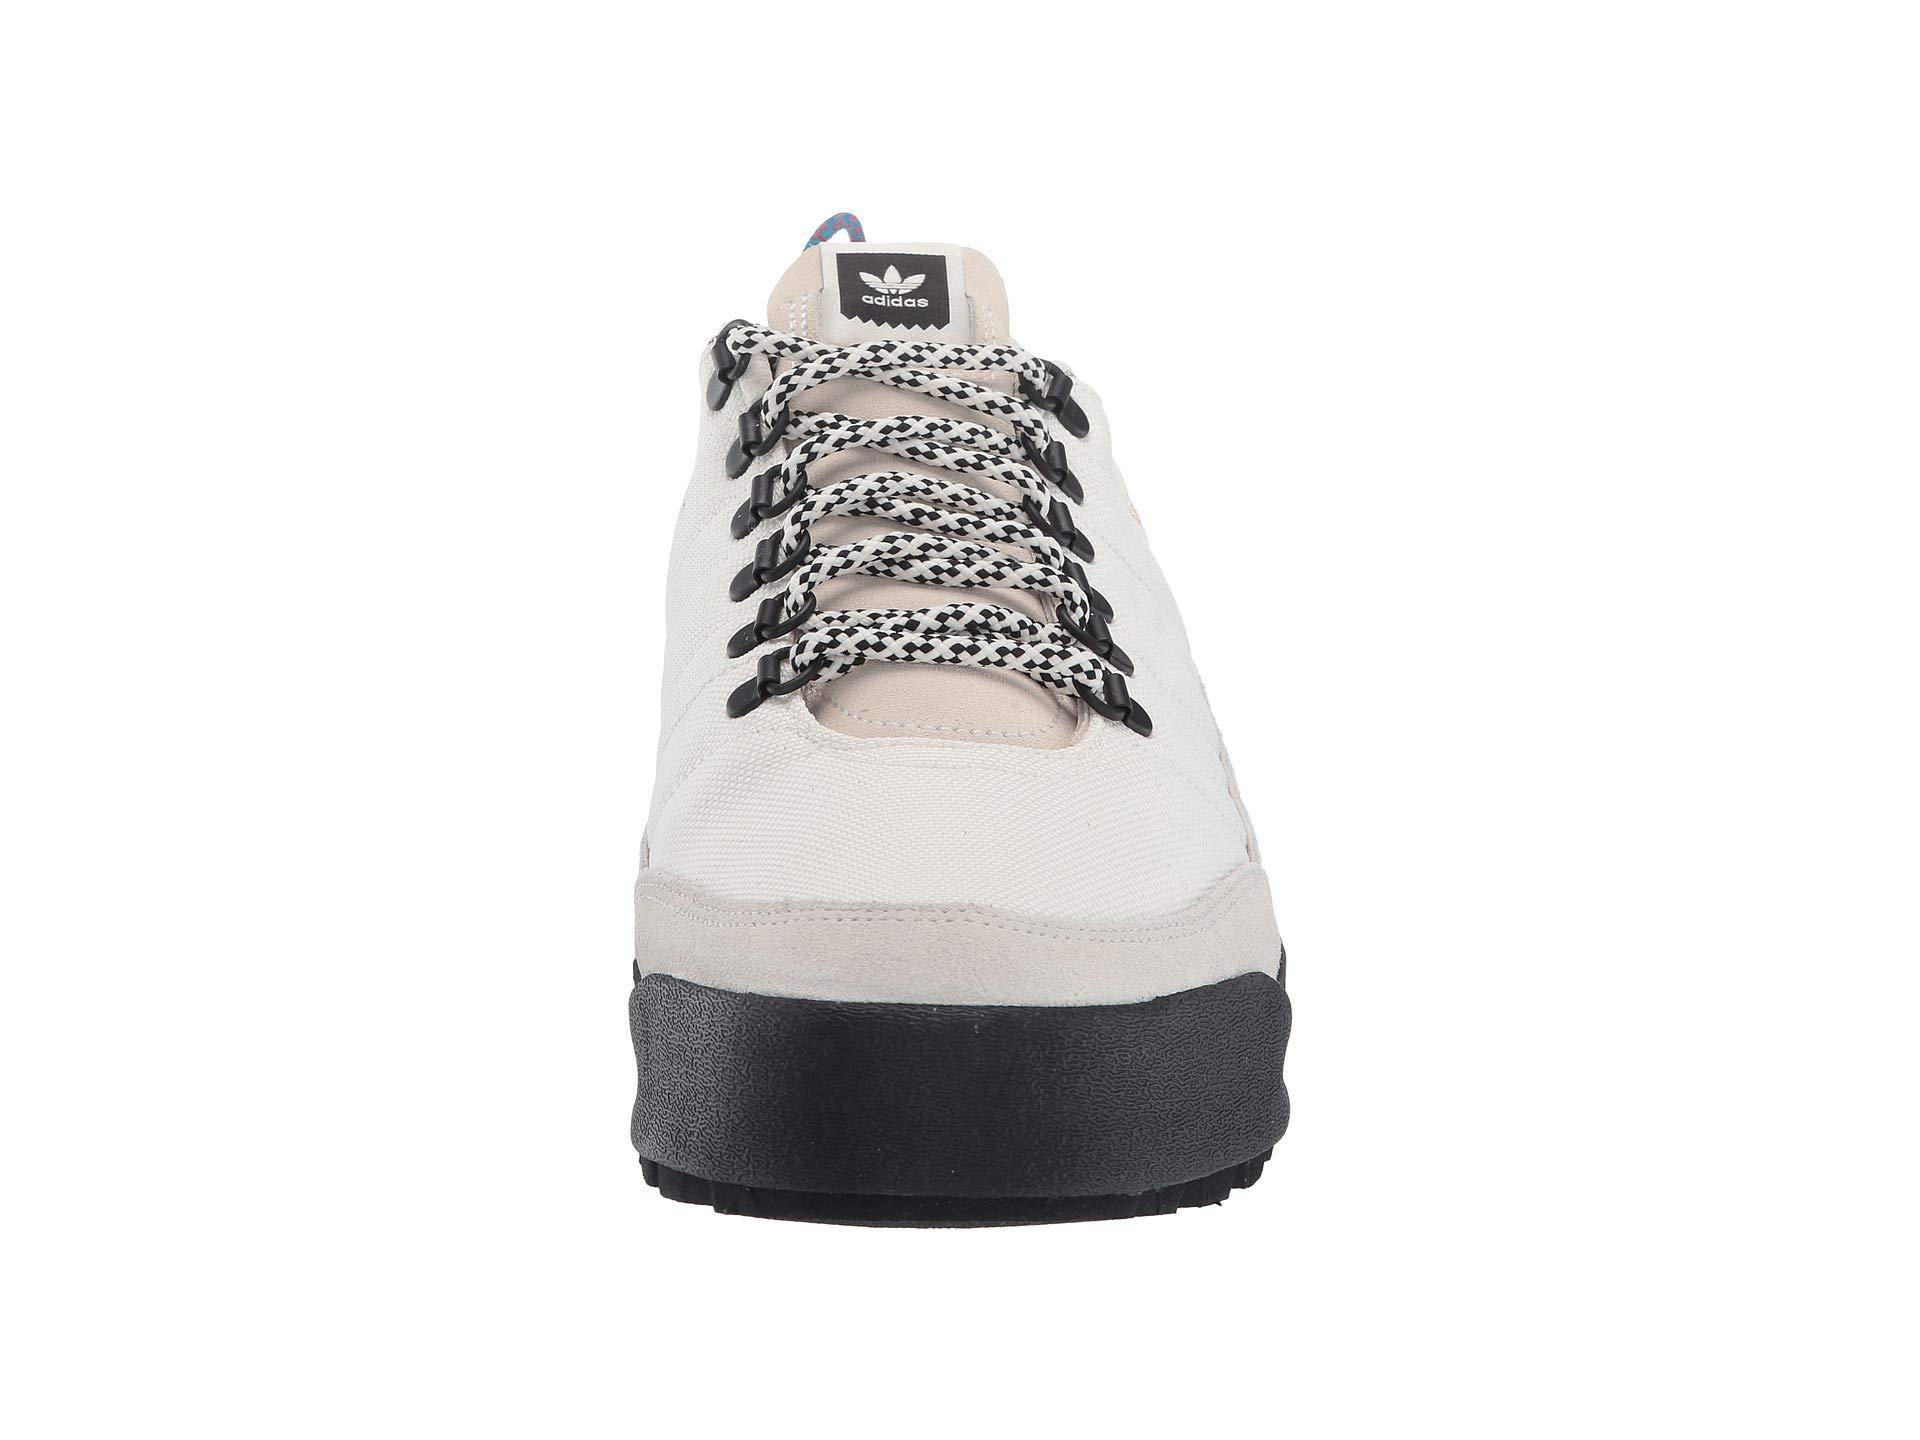 Adidas Originals - Jake Boot 2.0 Low (off-white raw White core. View  fullscreen c4573c43d